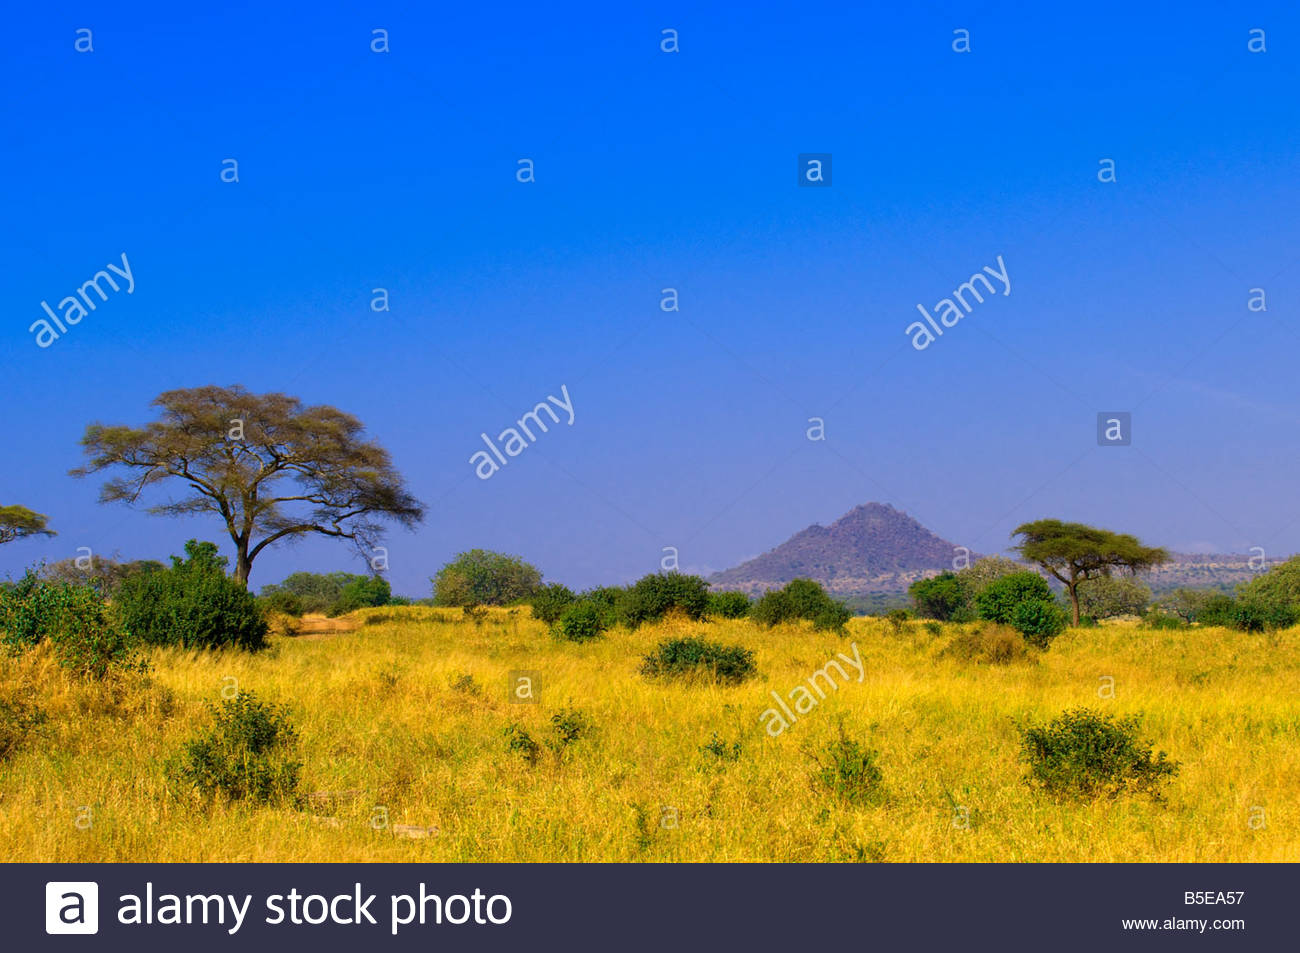 Acacia trees Tarangire National Park Tanzania - Stock Image